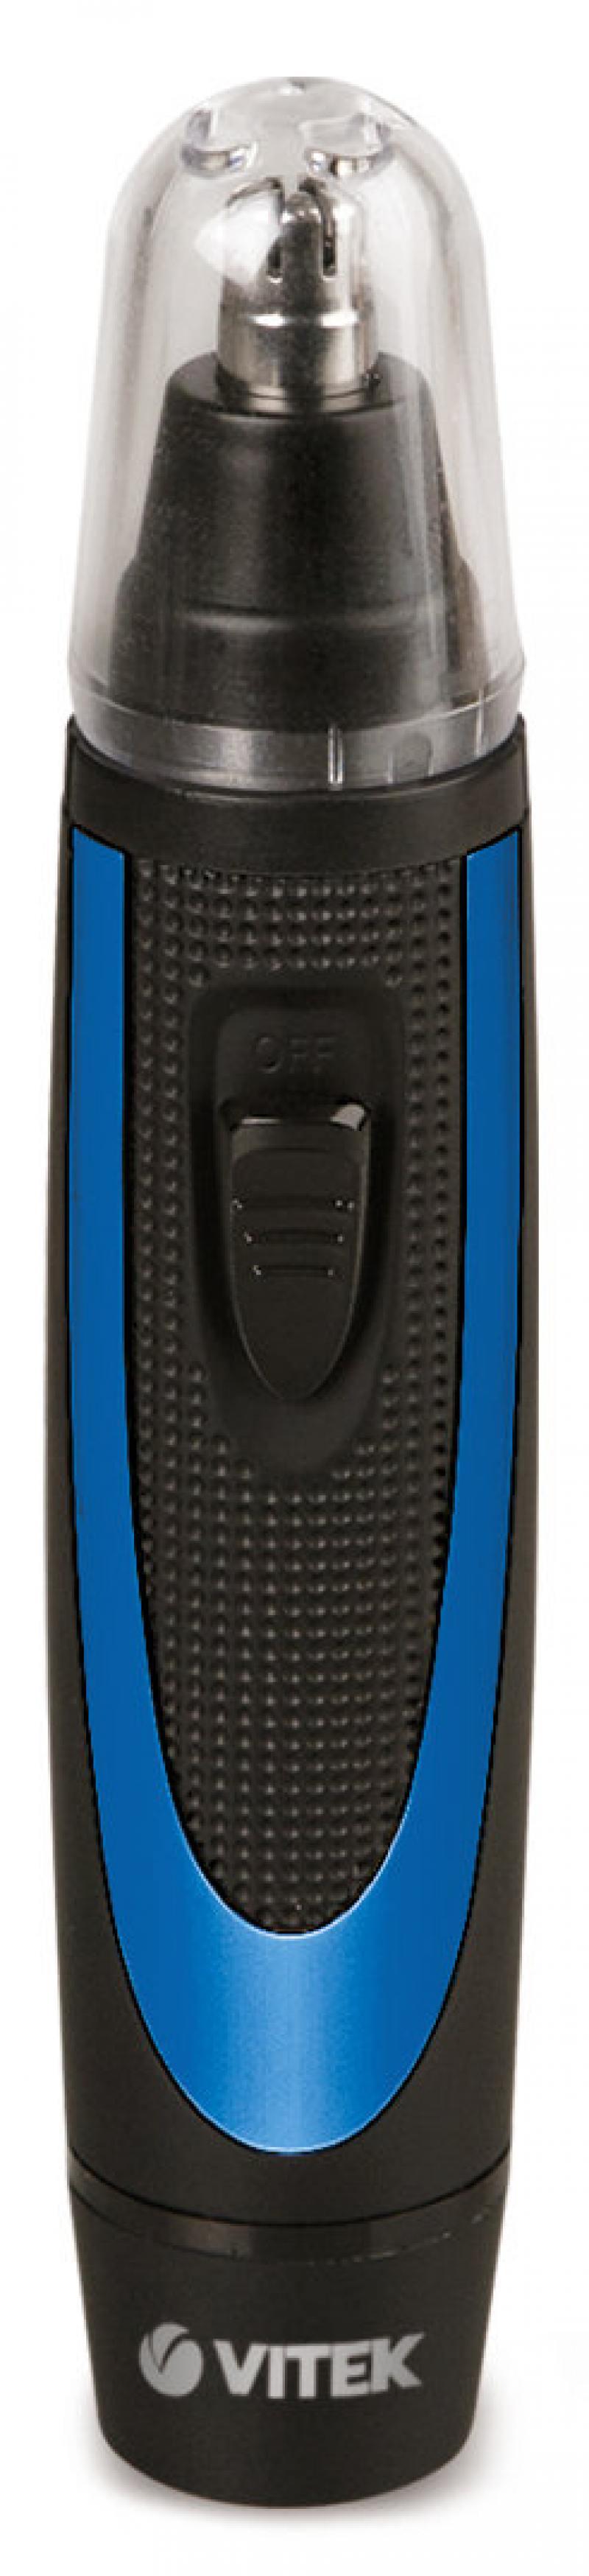 2551(В) Триммер VITEK DC 1.5В Батарея: 1*AA 1.5В (не включена) Лезвия: Подвижные лезвия.